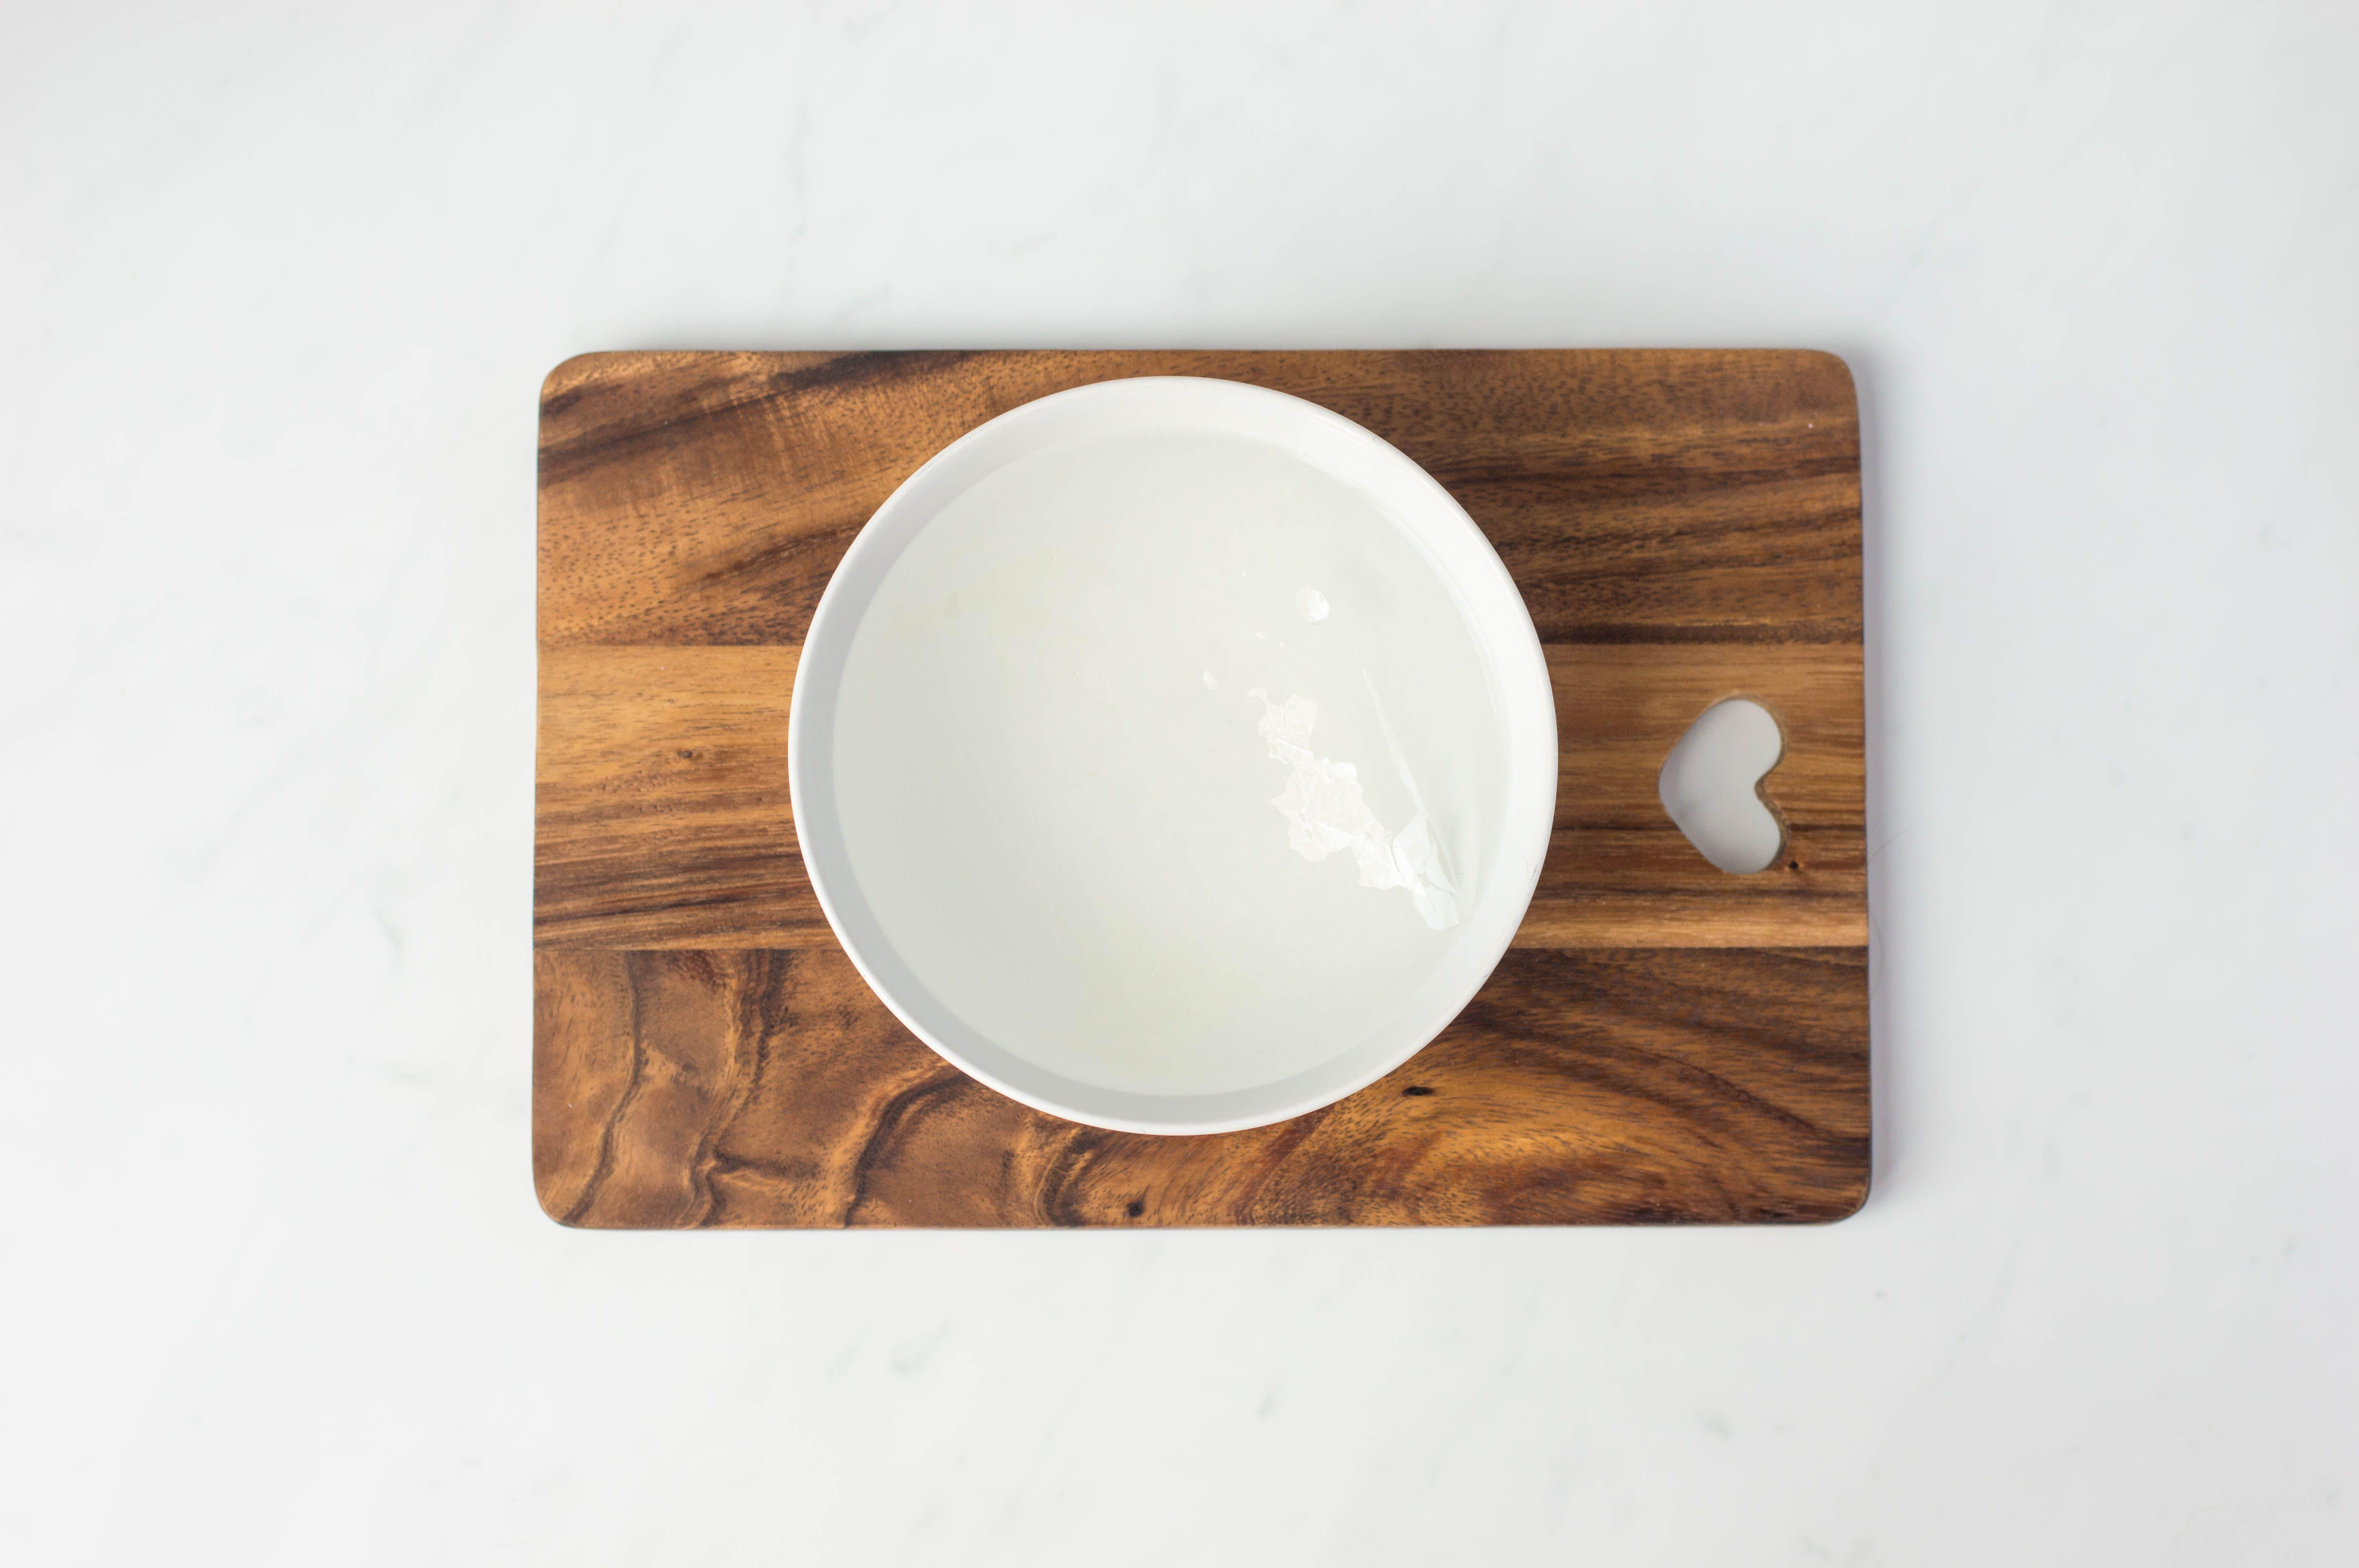 Soak gelatin in cold water